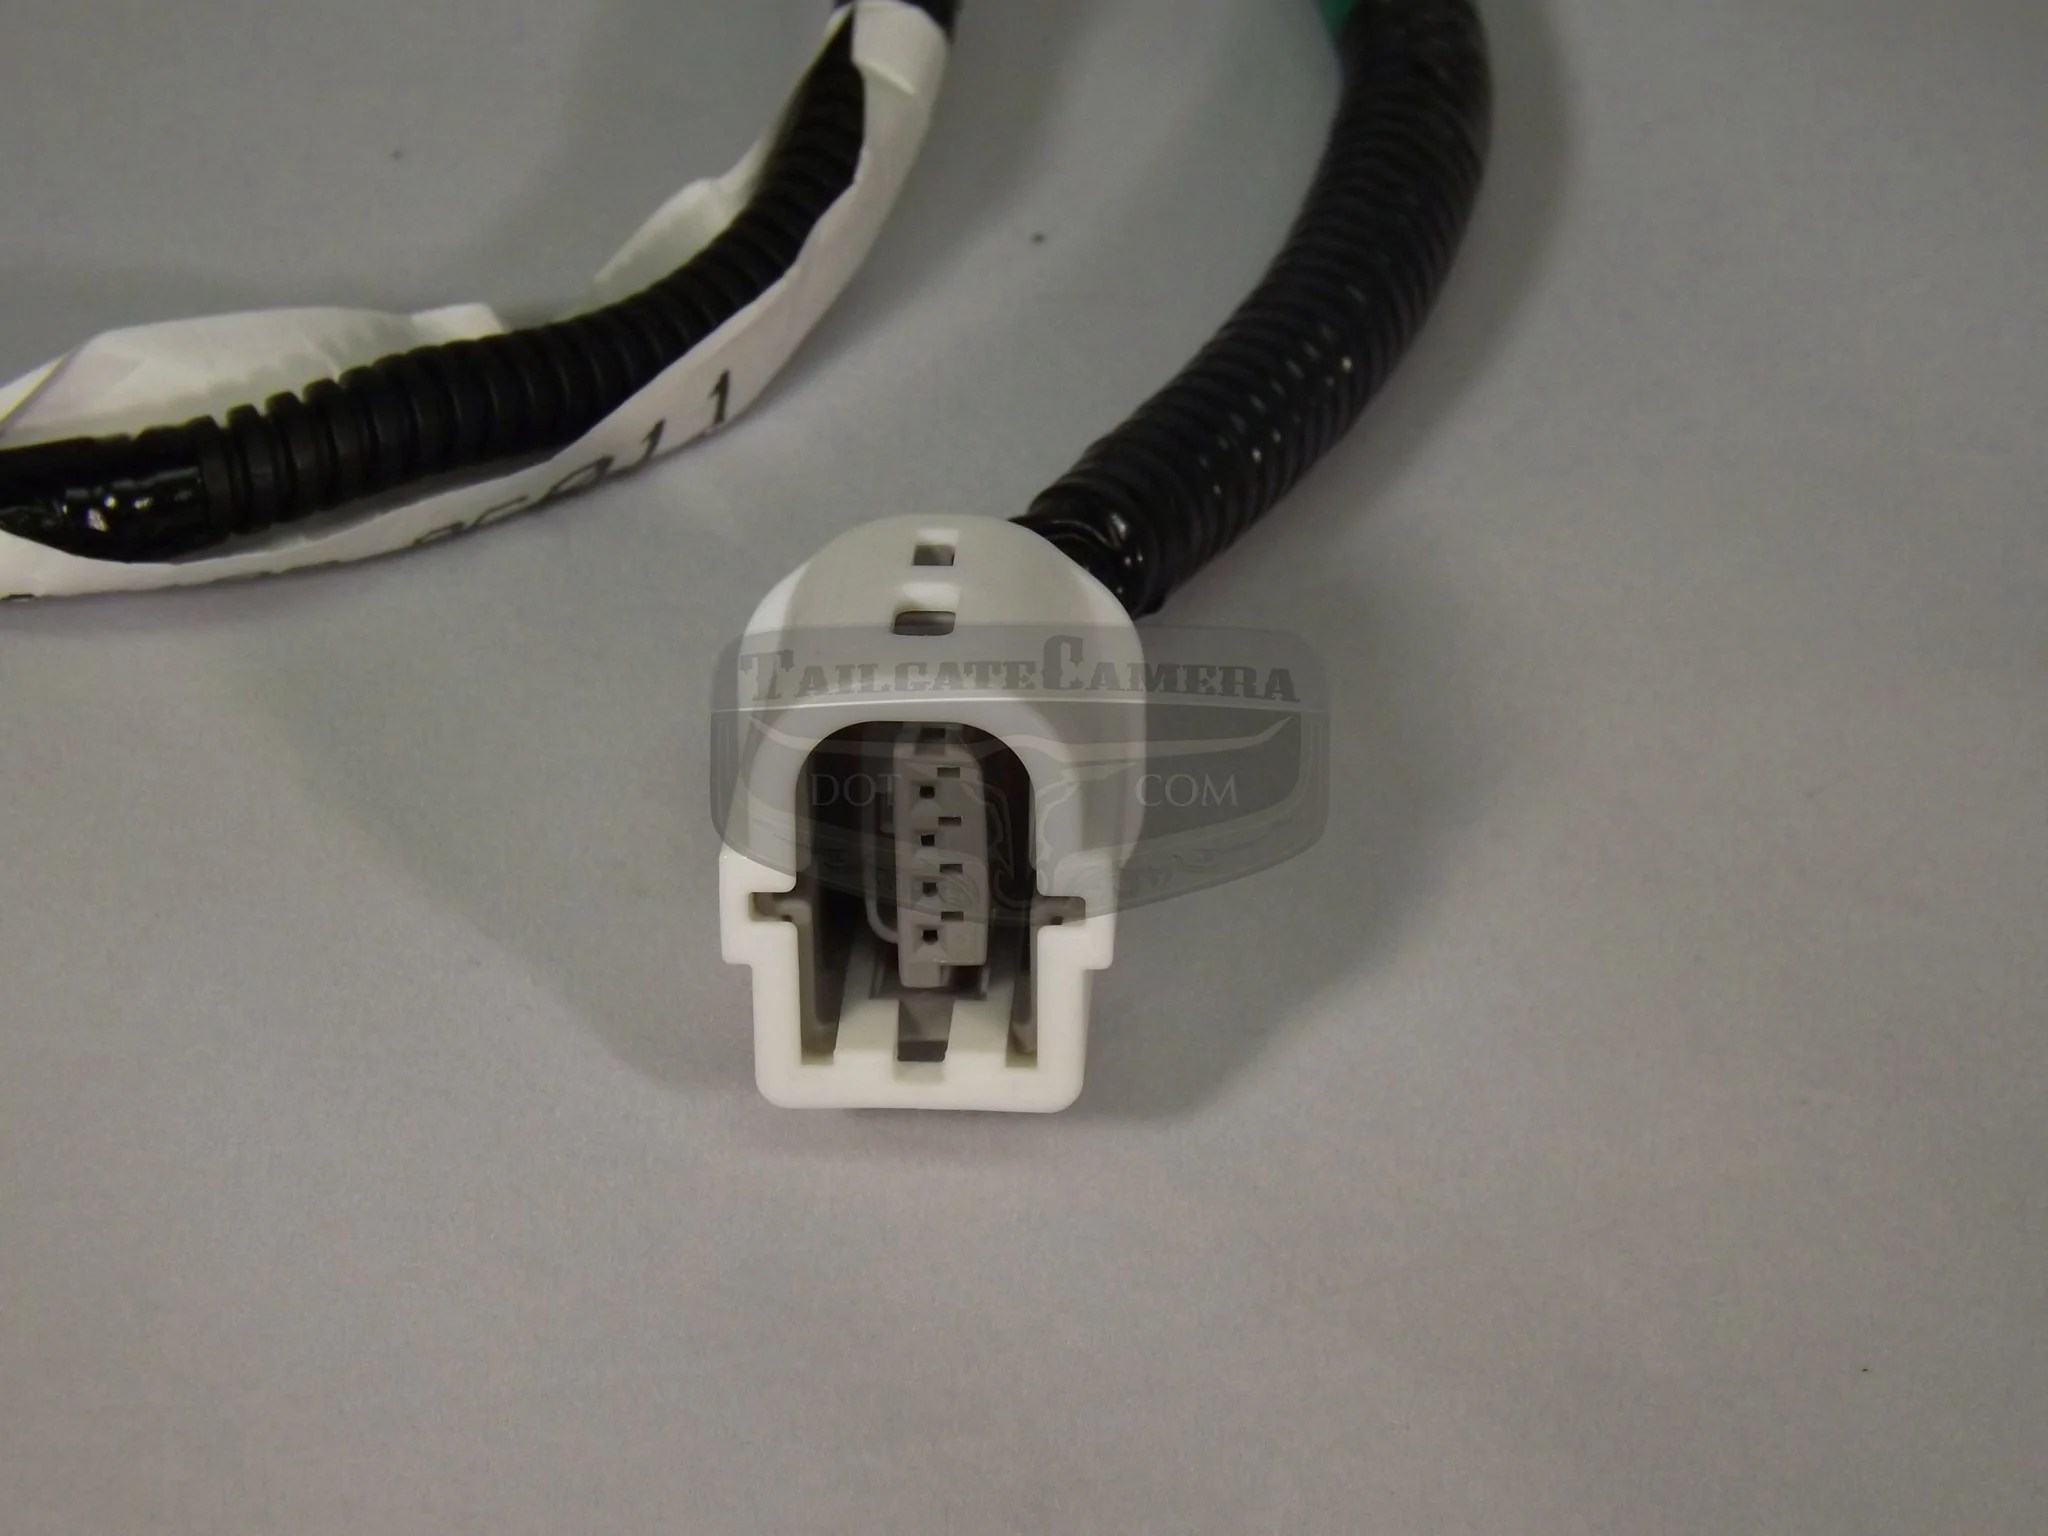 2010 2013 tundra hd camera kit with oem wiring harness backup camera rh reversecamera com 2000 toyota tundra wiring harness toyota tundra wiring harness  [ 2048 x 1536 Pixel ]